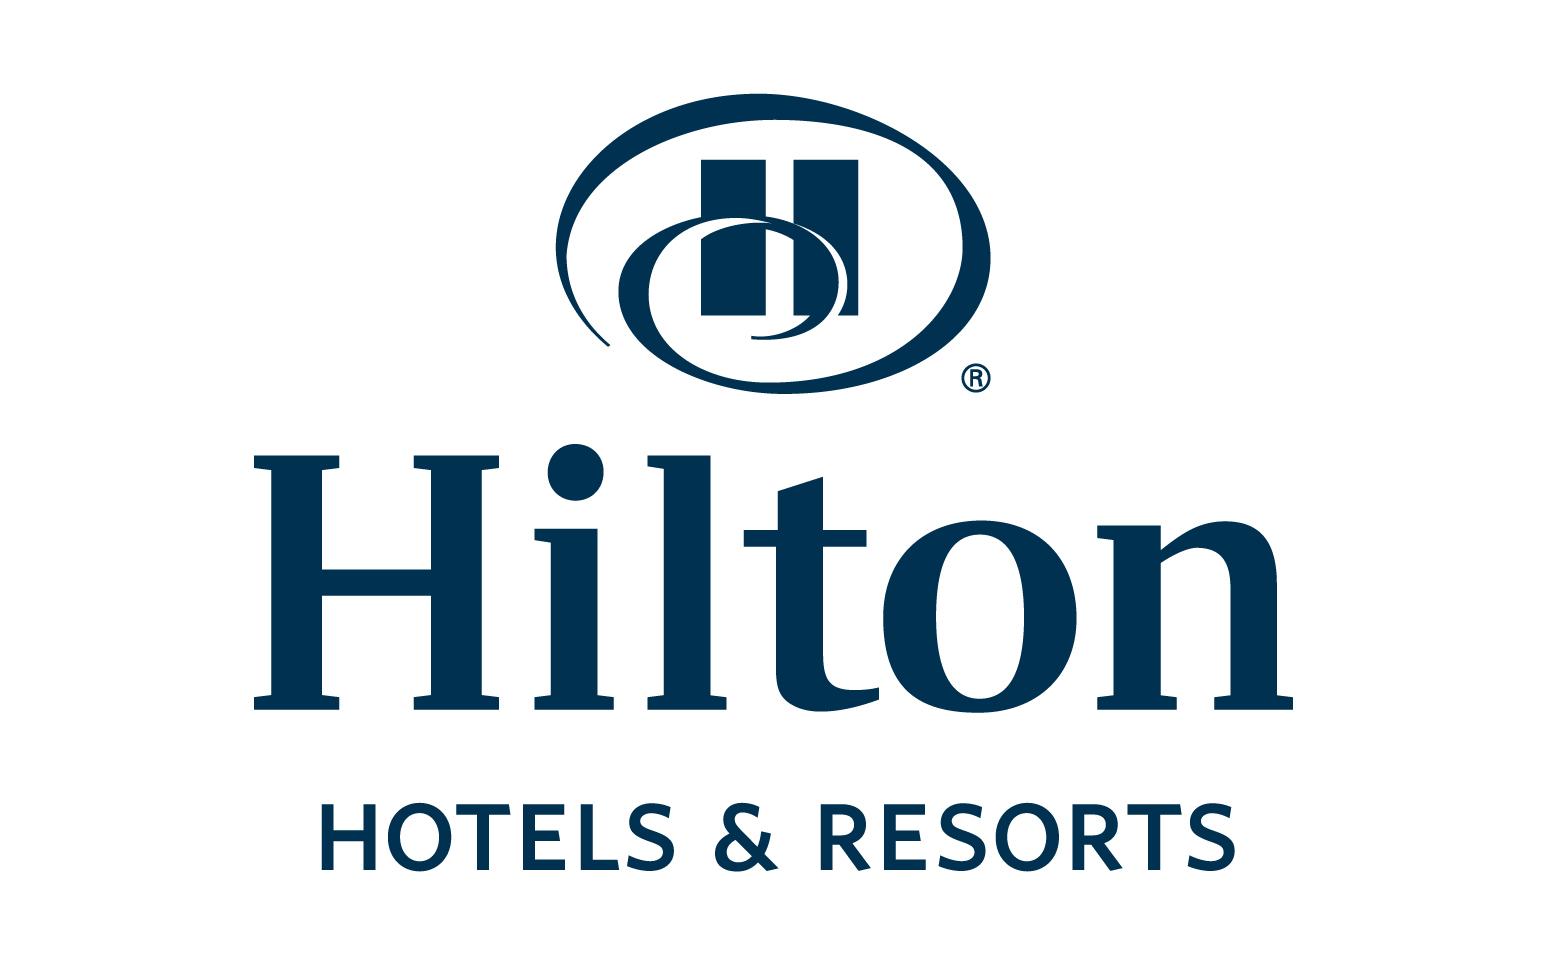 Hilton-Logo-Meaning-history.jpg